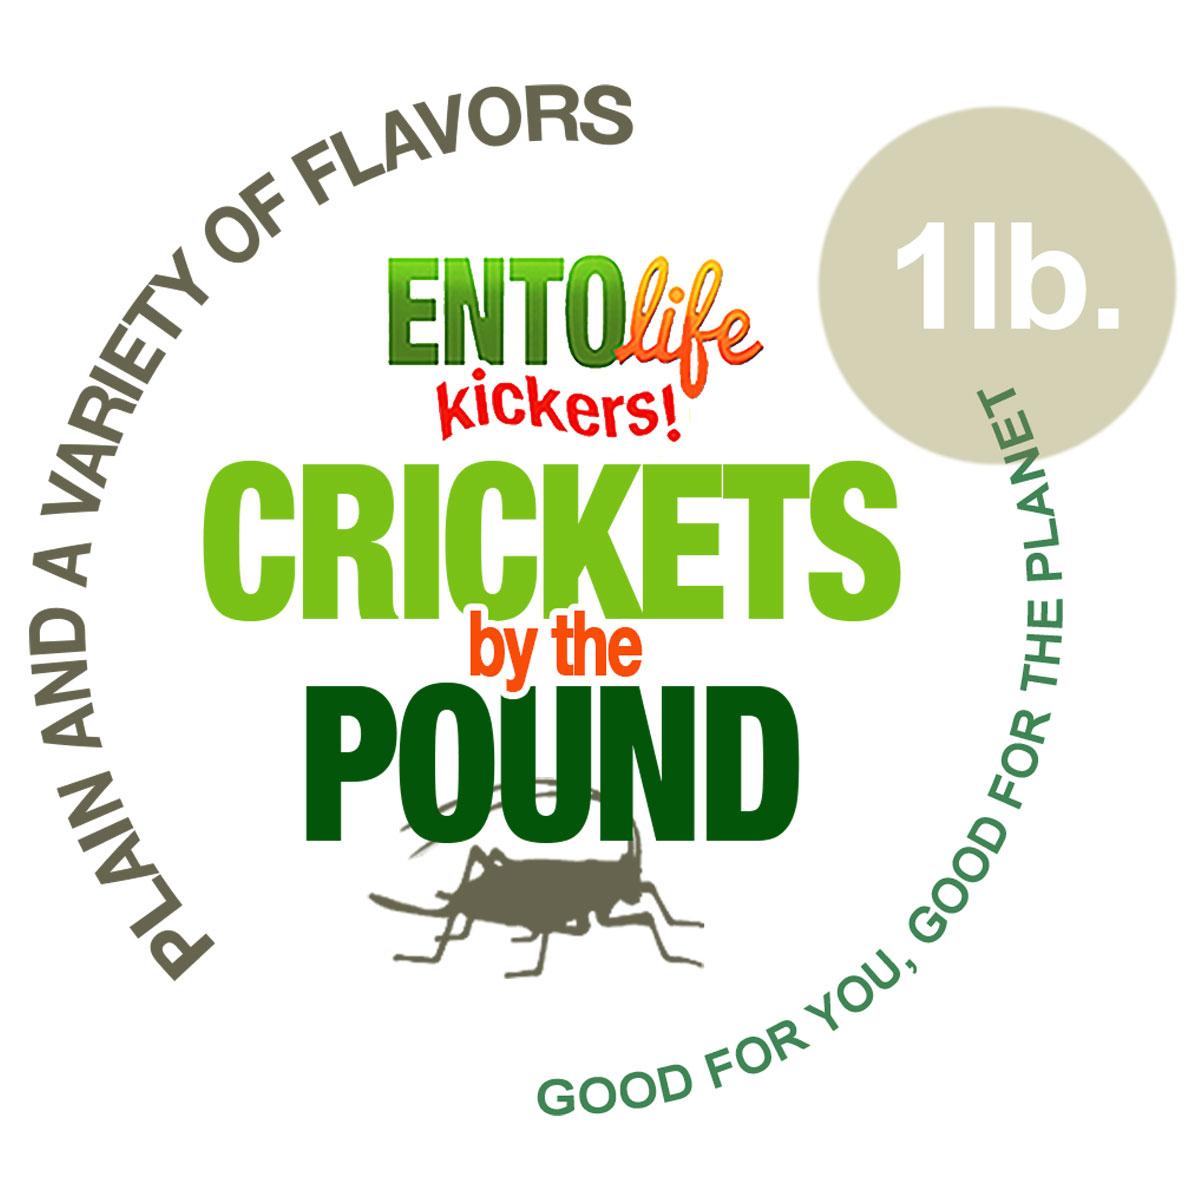 Crockets-by-the-Pound-Logo-260.jpg